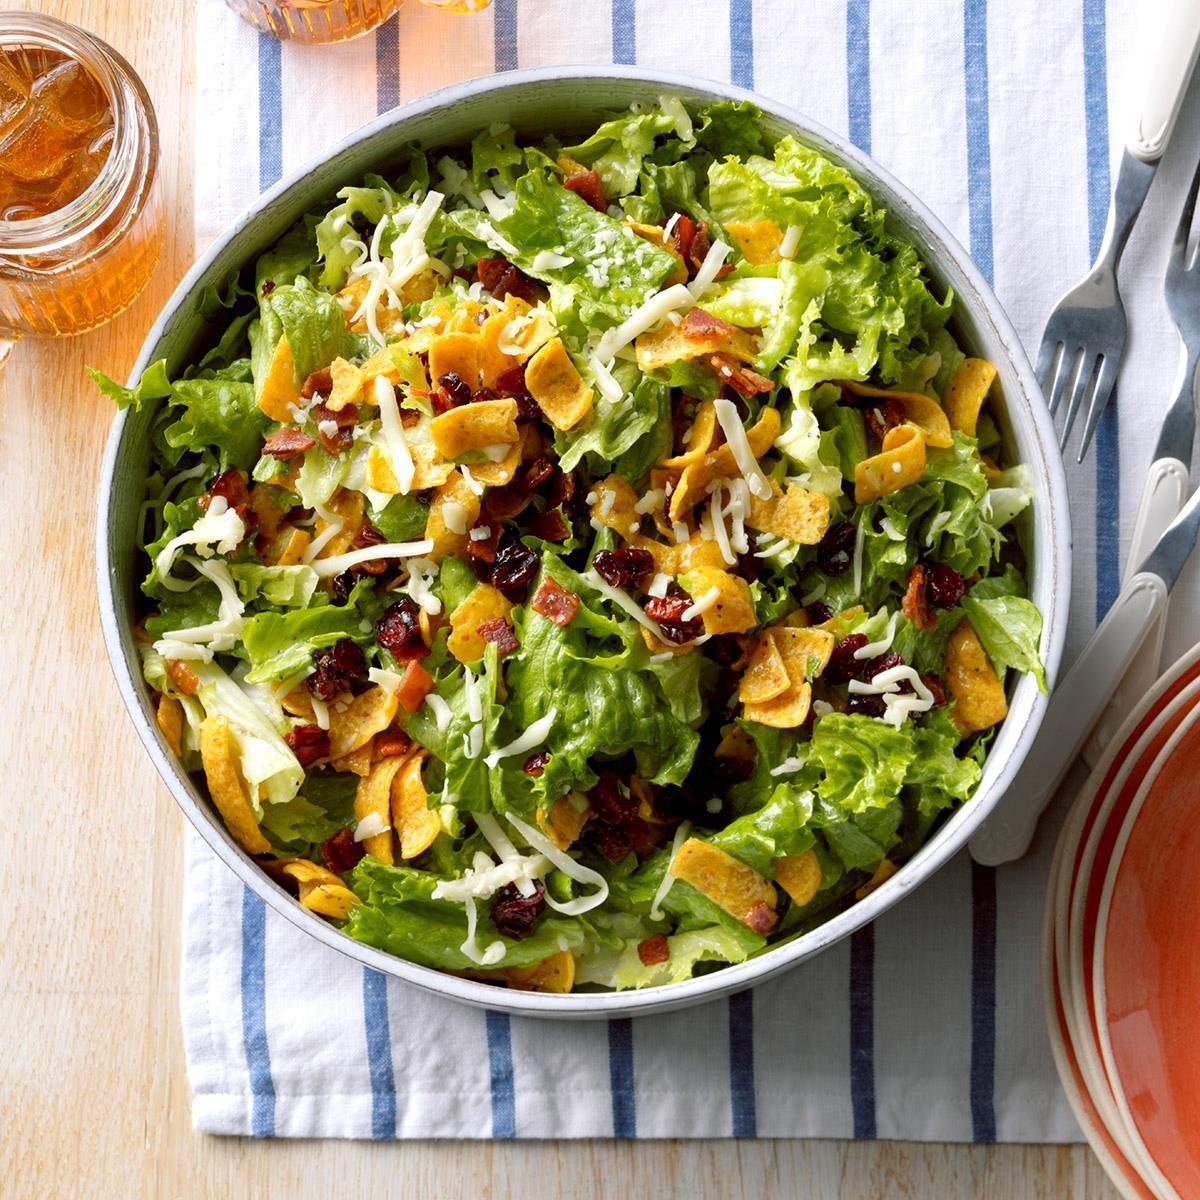 Mississippi: Yummy Corn Chip Salad